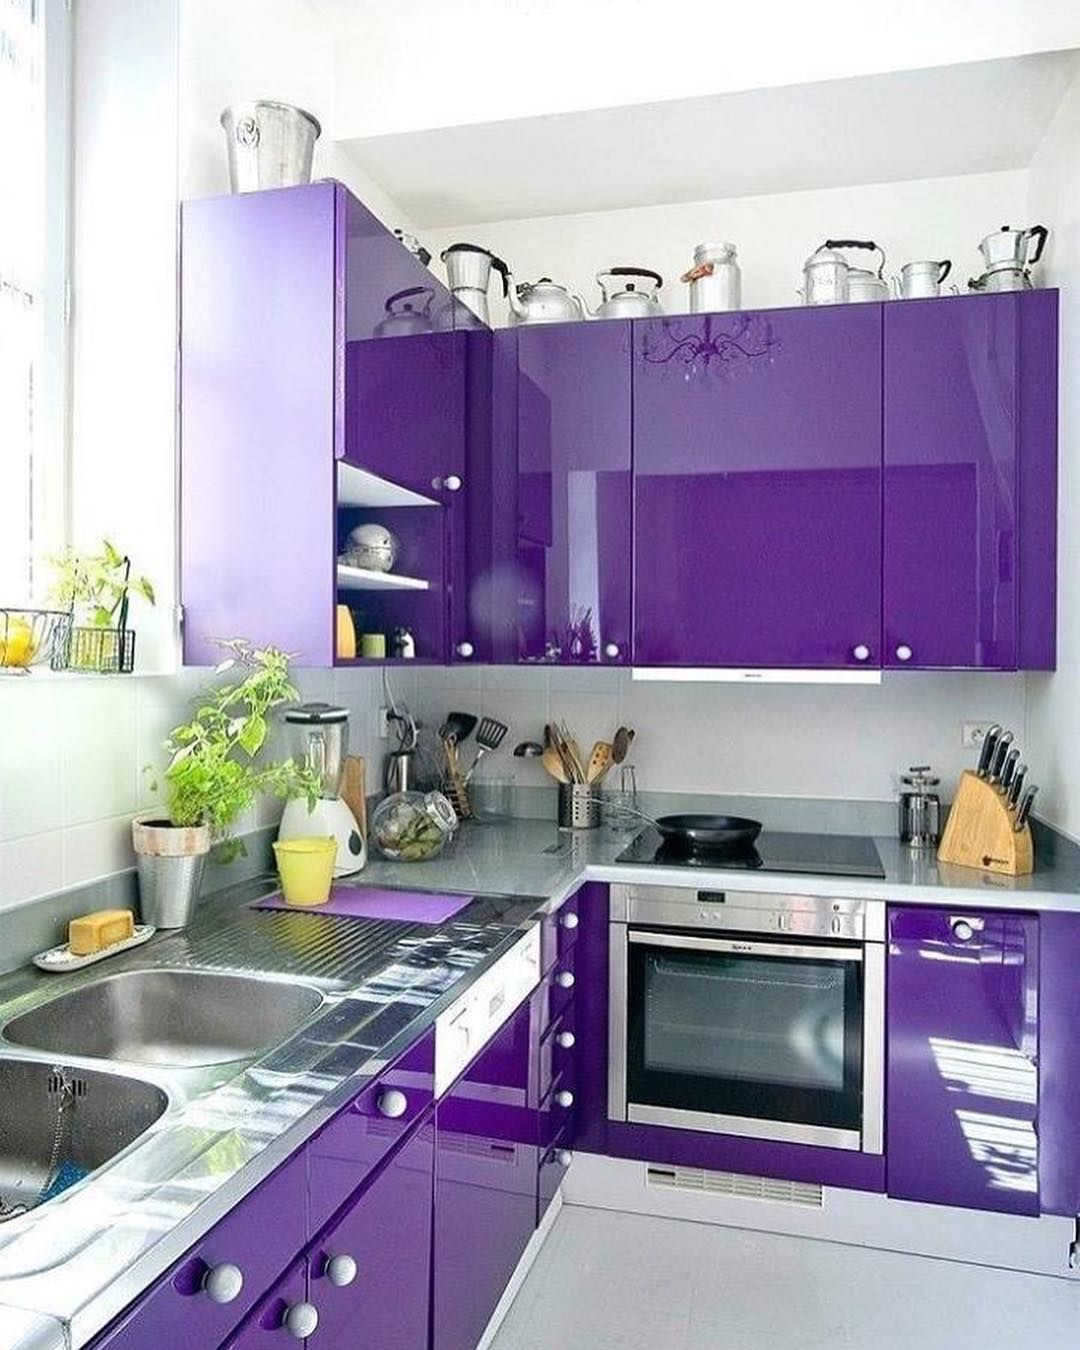 Ideas De Cocinas Modernas En Colores Claros Ideasdecoracion Decoracion Disenodeinteri Purple Kitchen Cabinets Home Decor Kitchen Kitchen Furniture Design